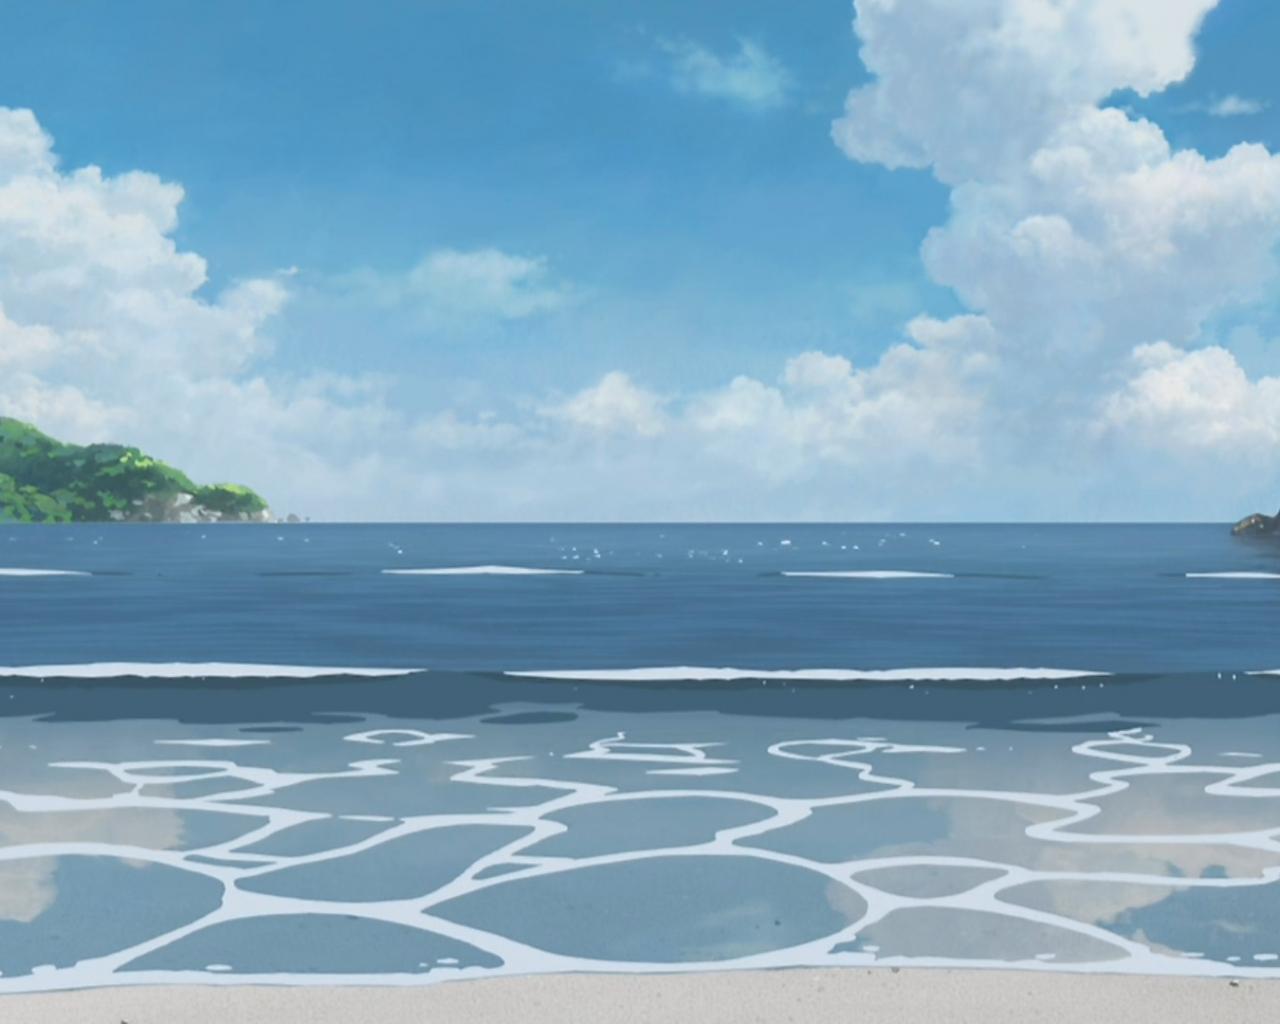 Free Download 20027 Anime Scenery Wallpaper 1920 X 1080 Wallpaper Hd Wallpaper 1920x1080 For Your Desktop Mobile Tablet Explore 43 Anime Scenery Wallpaper Scenery Wallpaper Backgrounds Hd Scenery Wallpapers